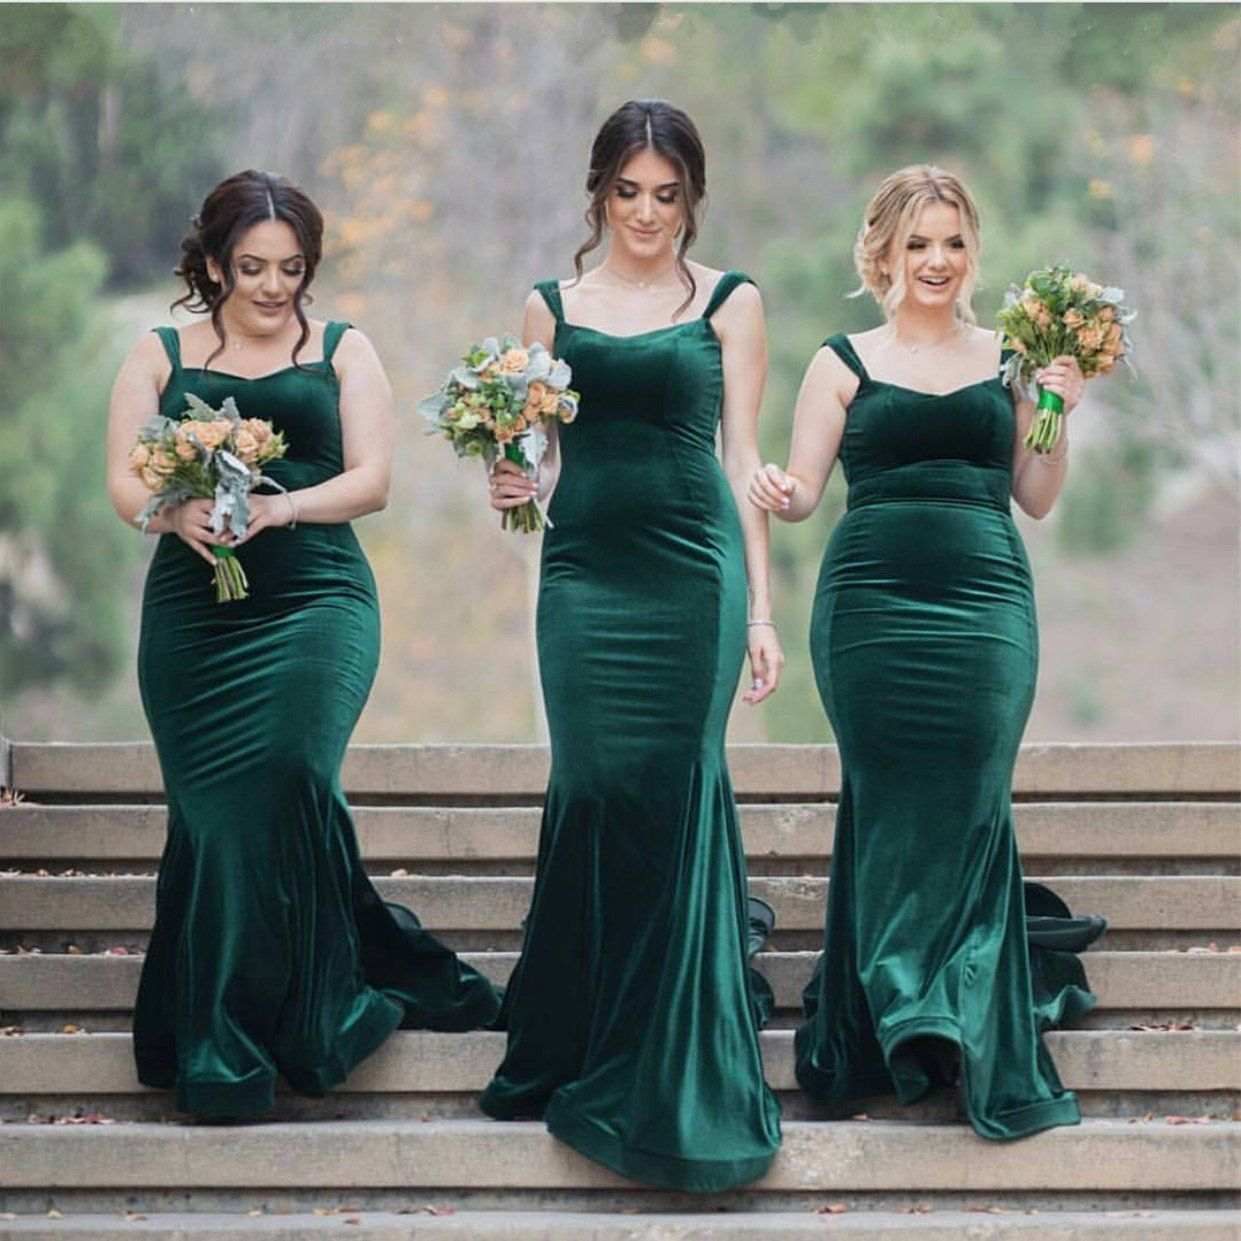 Sweetheart bridesmaid dresses long velvet formal evening gowns